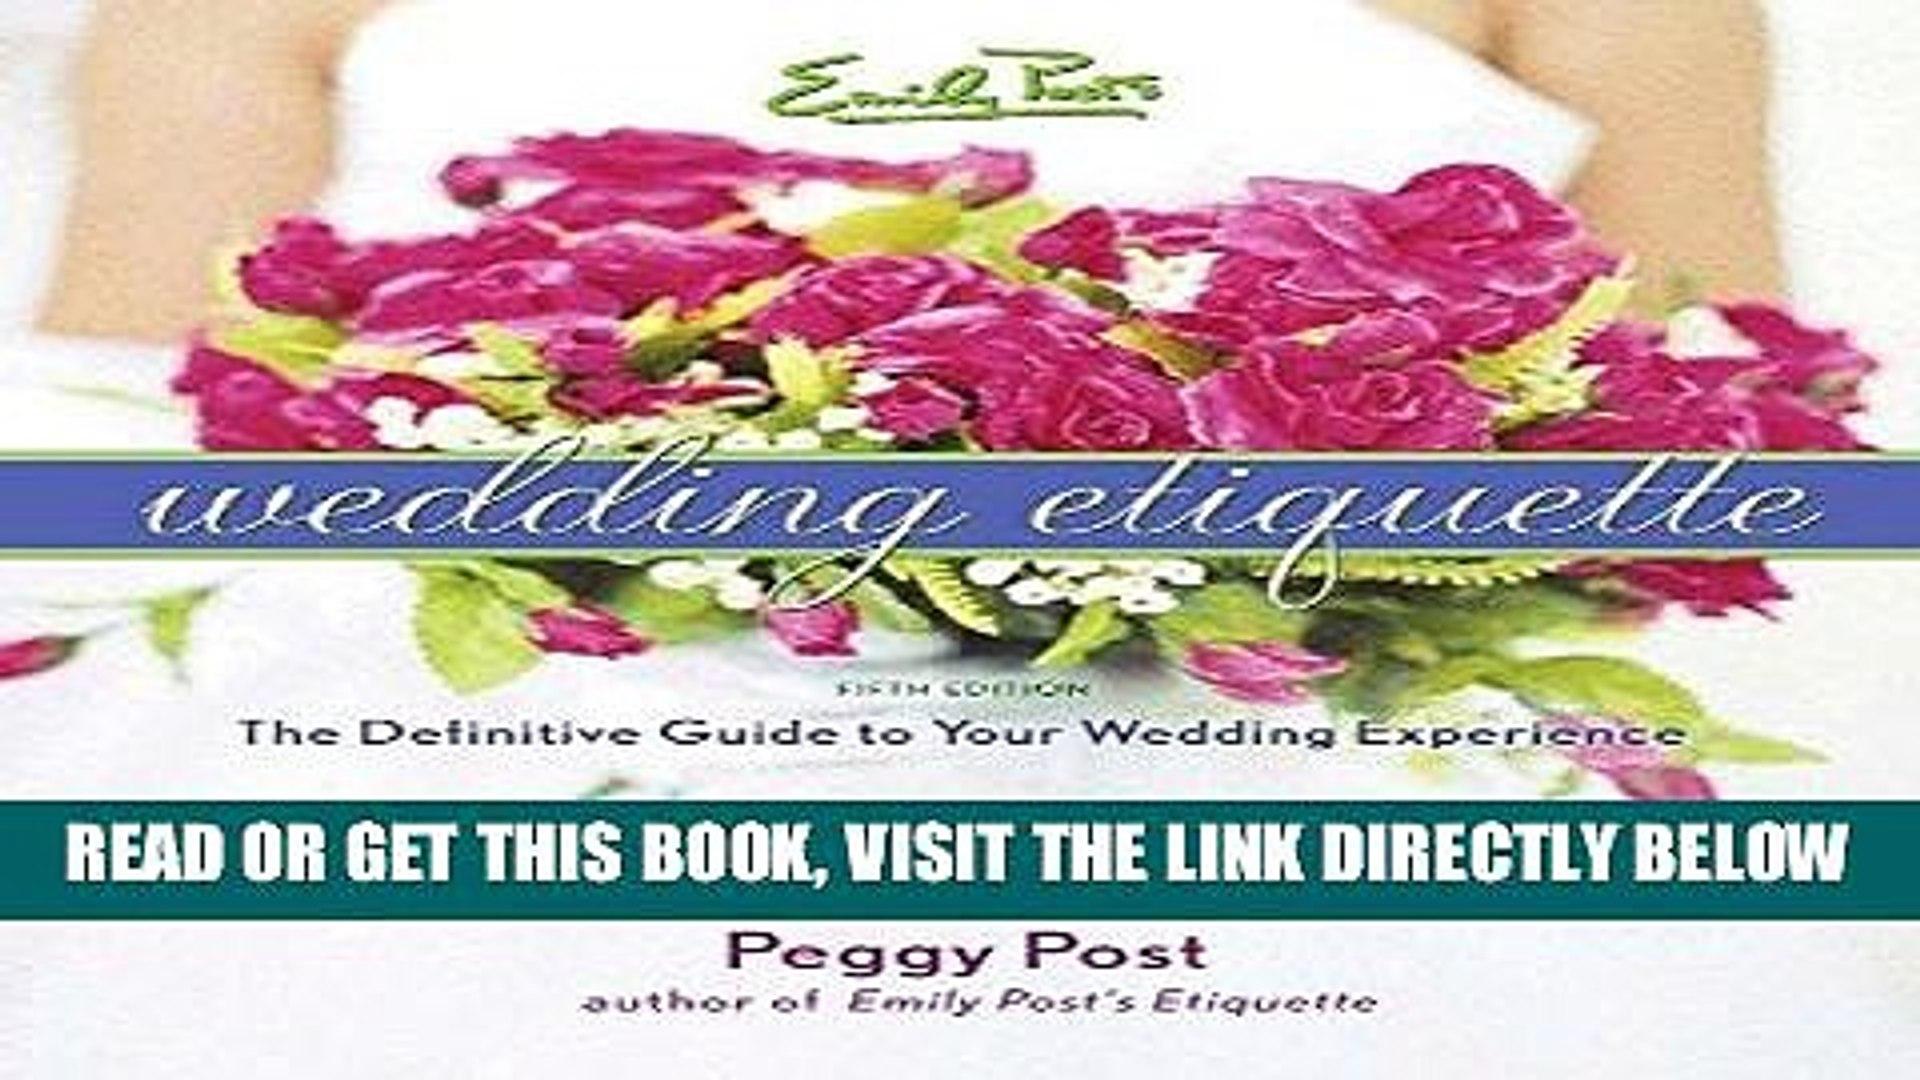 Emily Posts Wedding Etiquette 4e